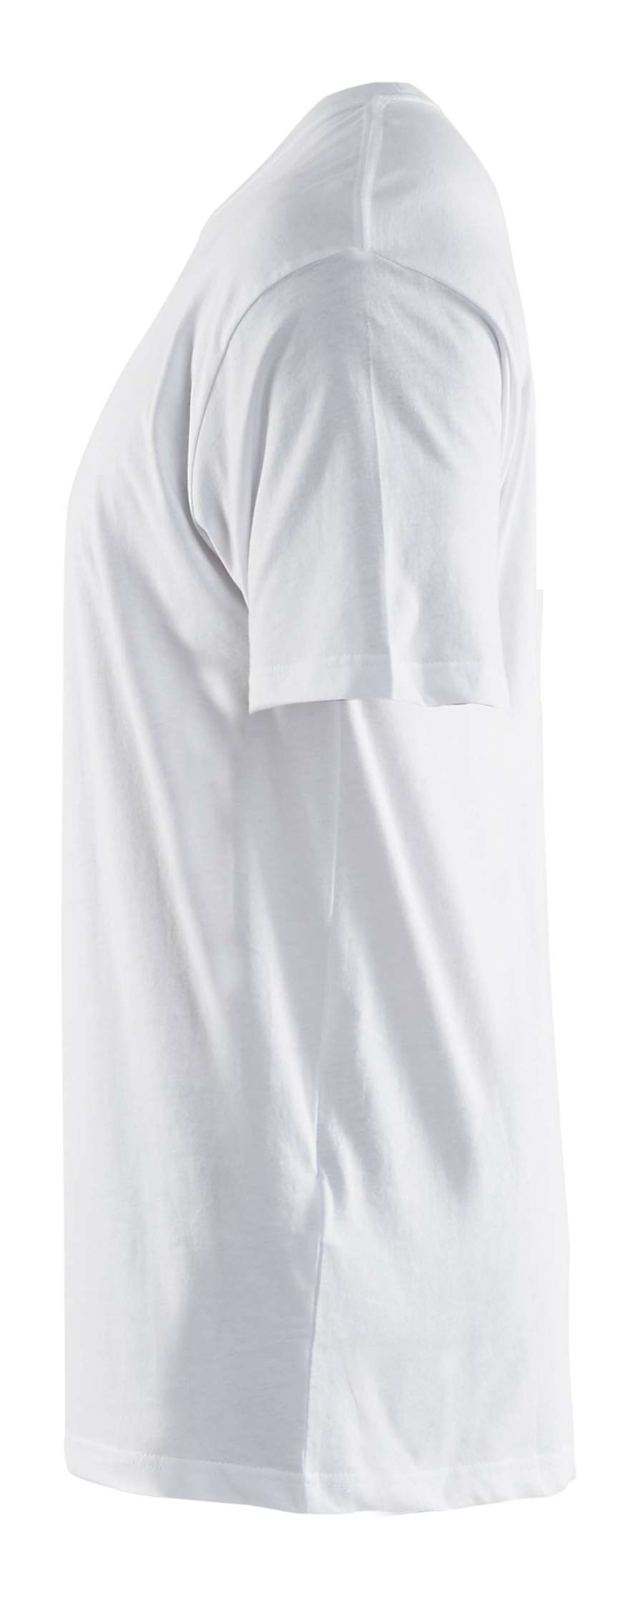 Blaklader T-shirts 33251042 5-pack wit(1000)